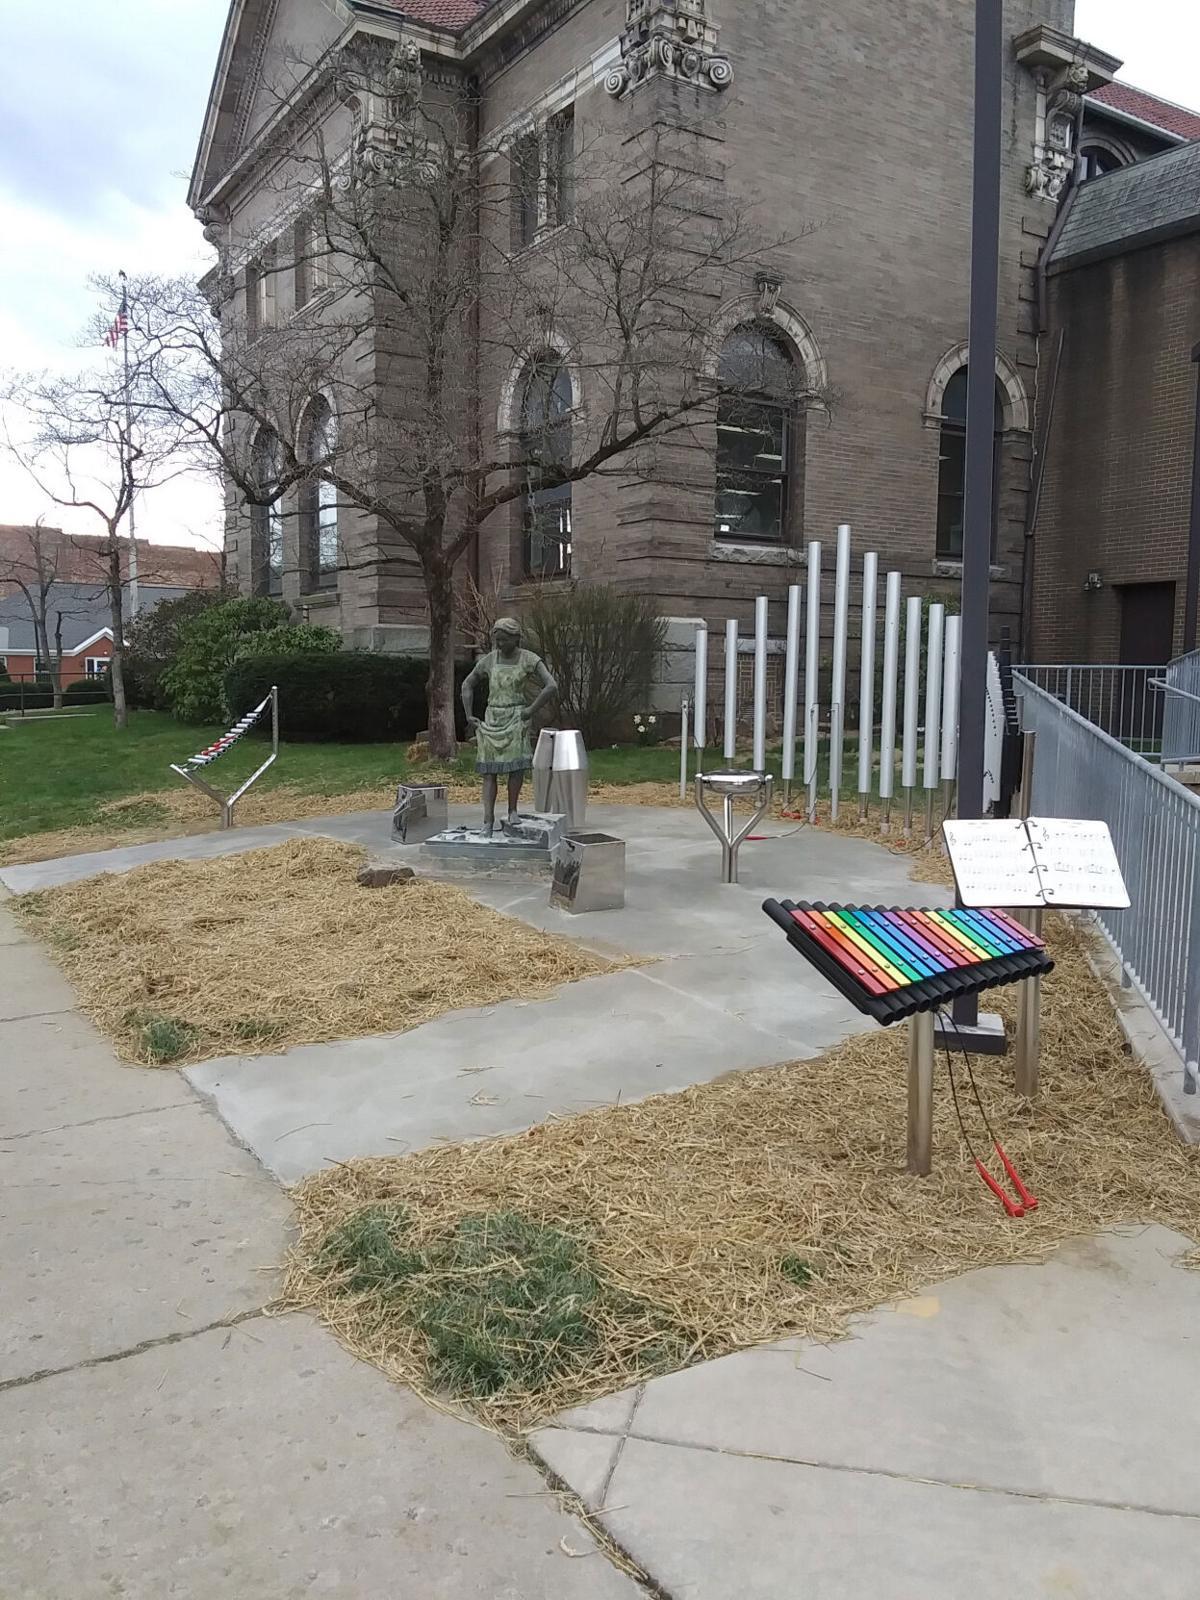 Music garden outside library expected to harvest interest